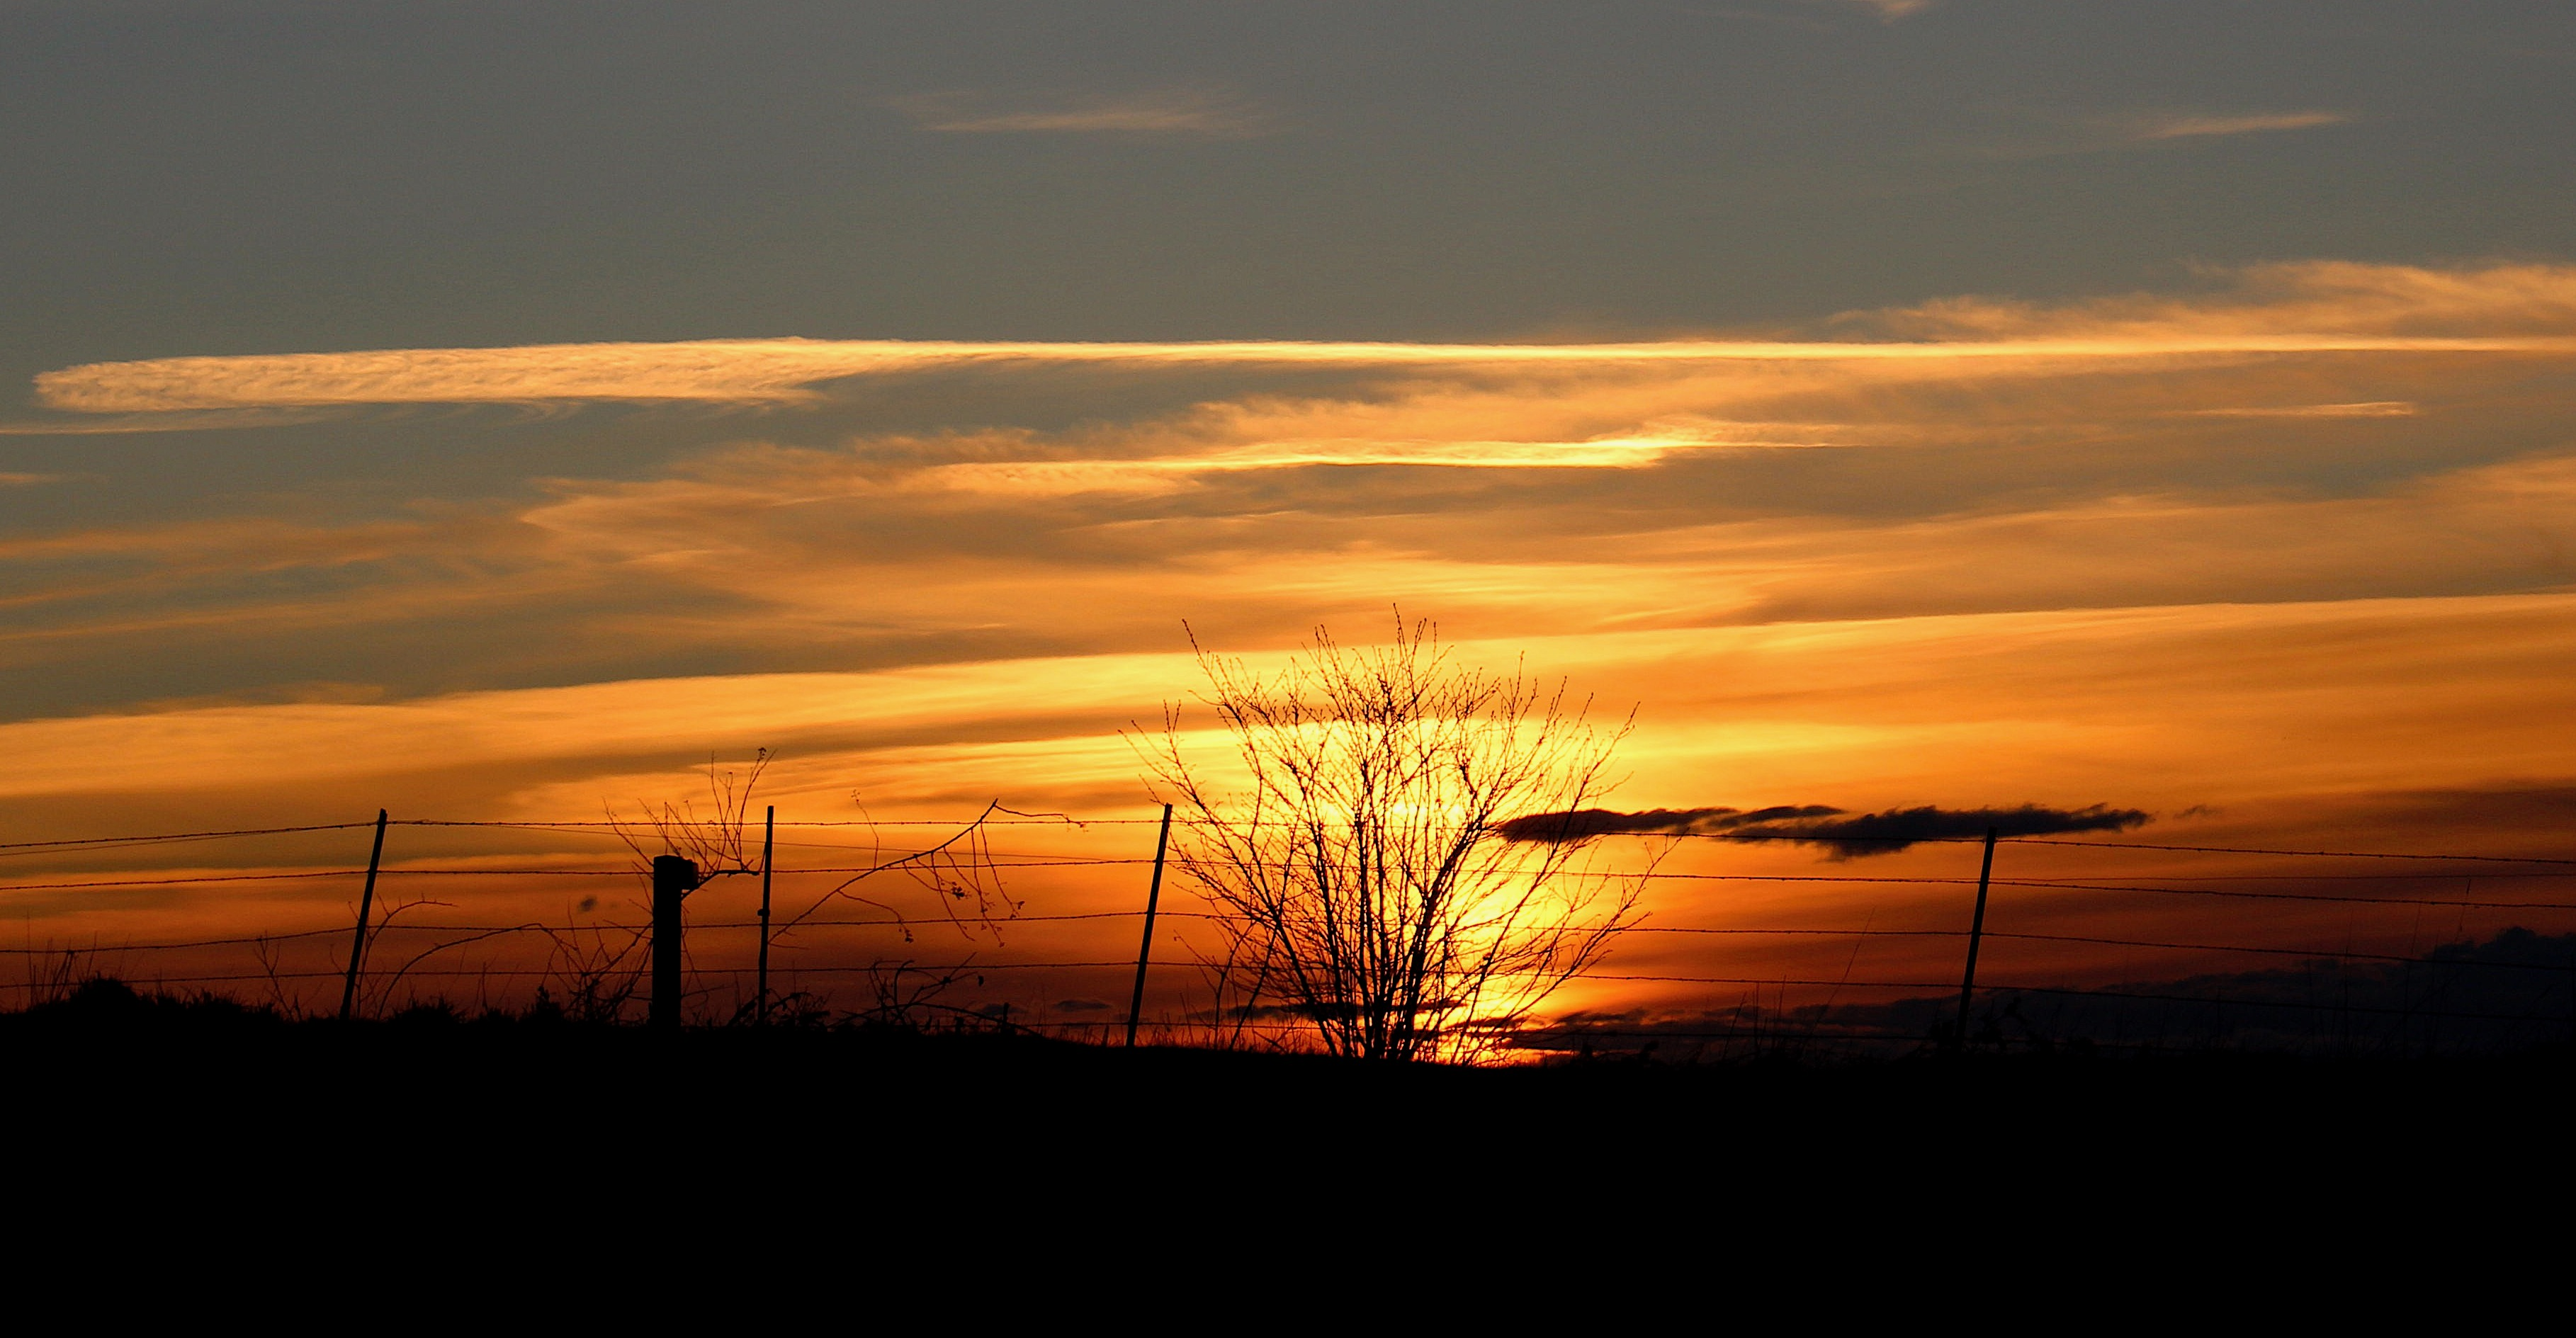 sunset223173